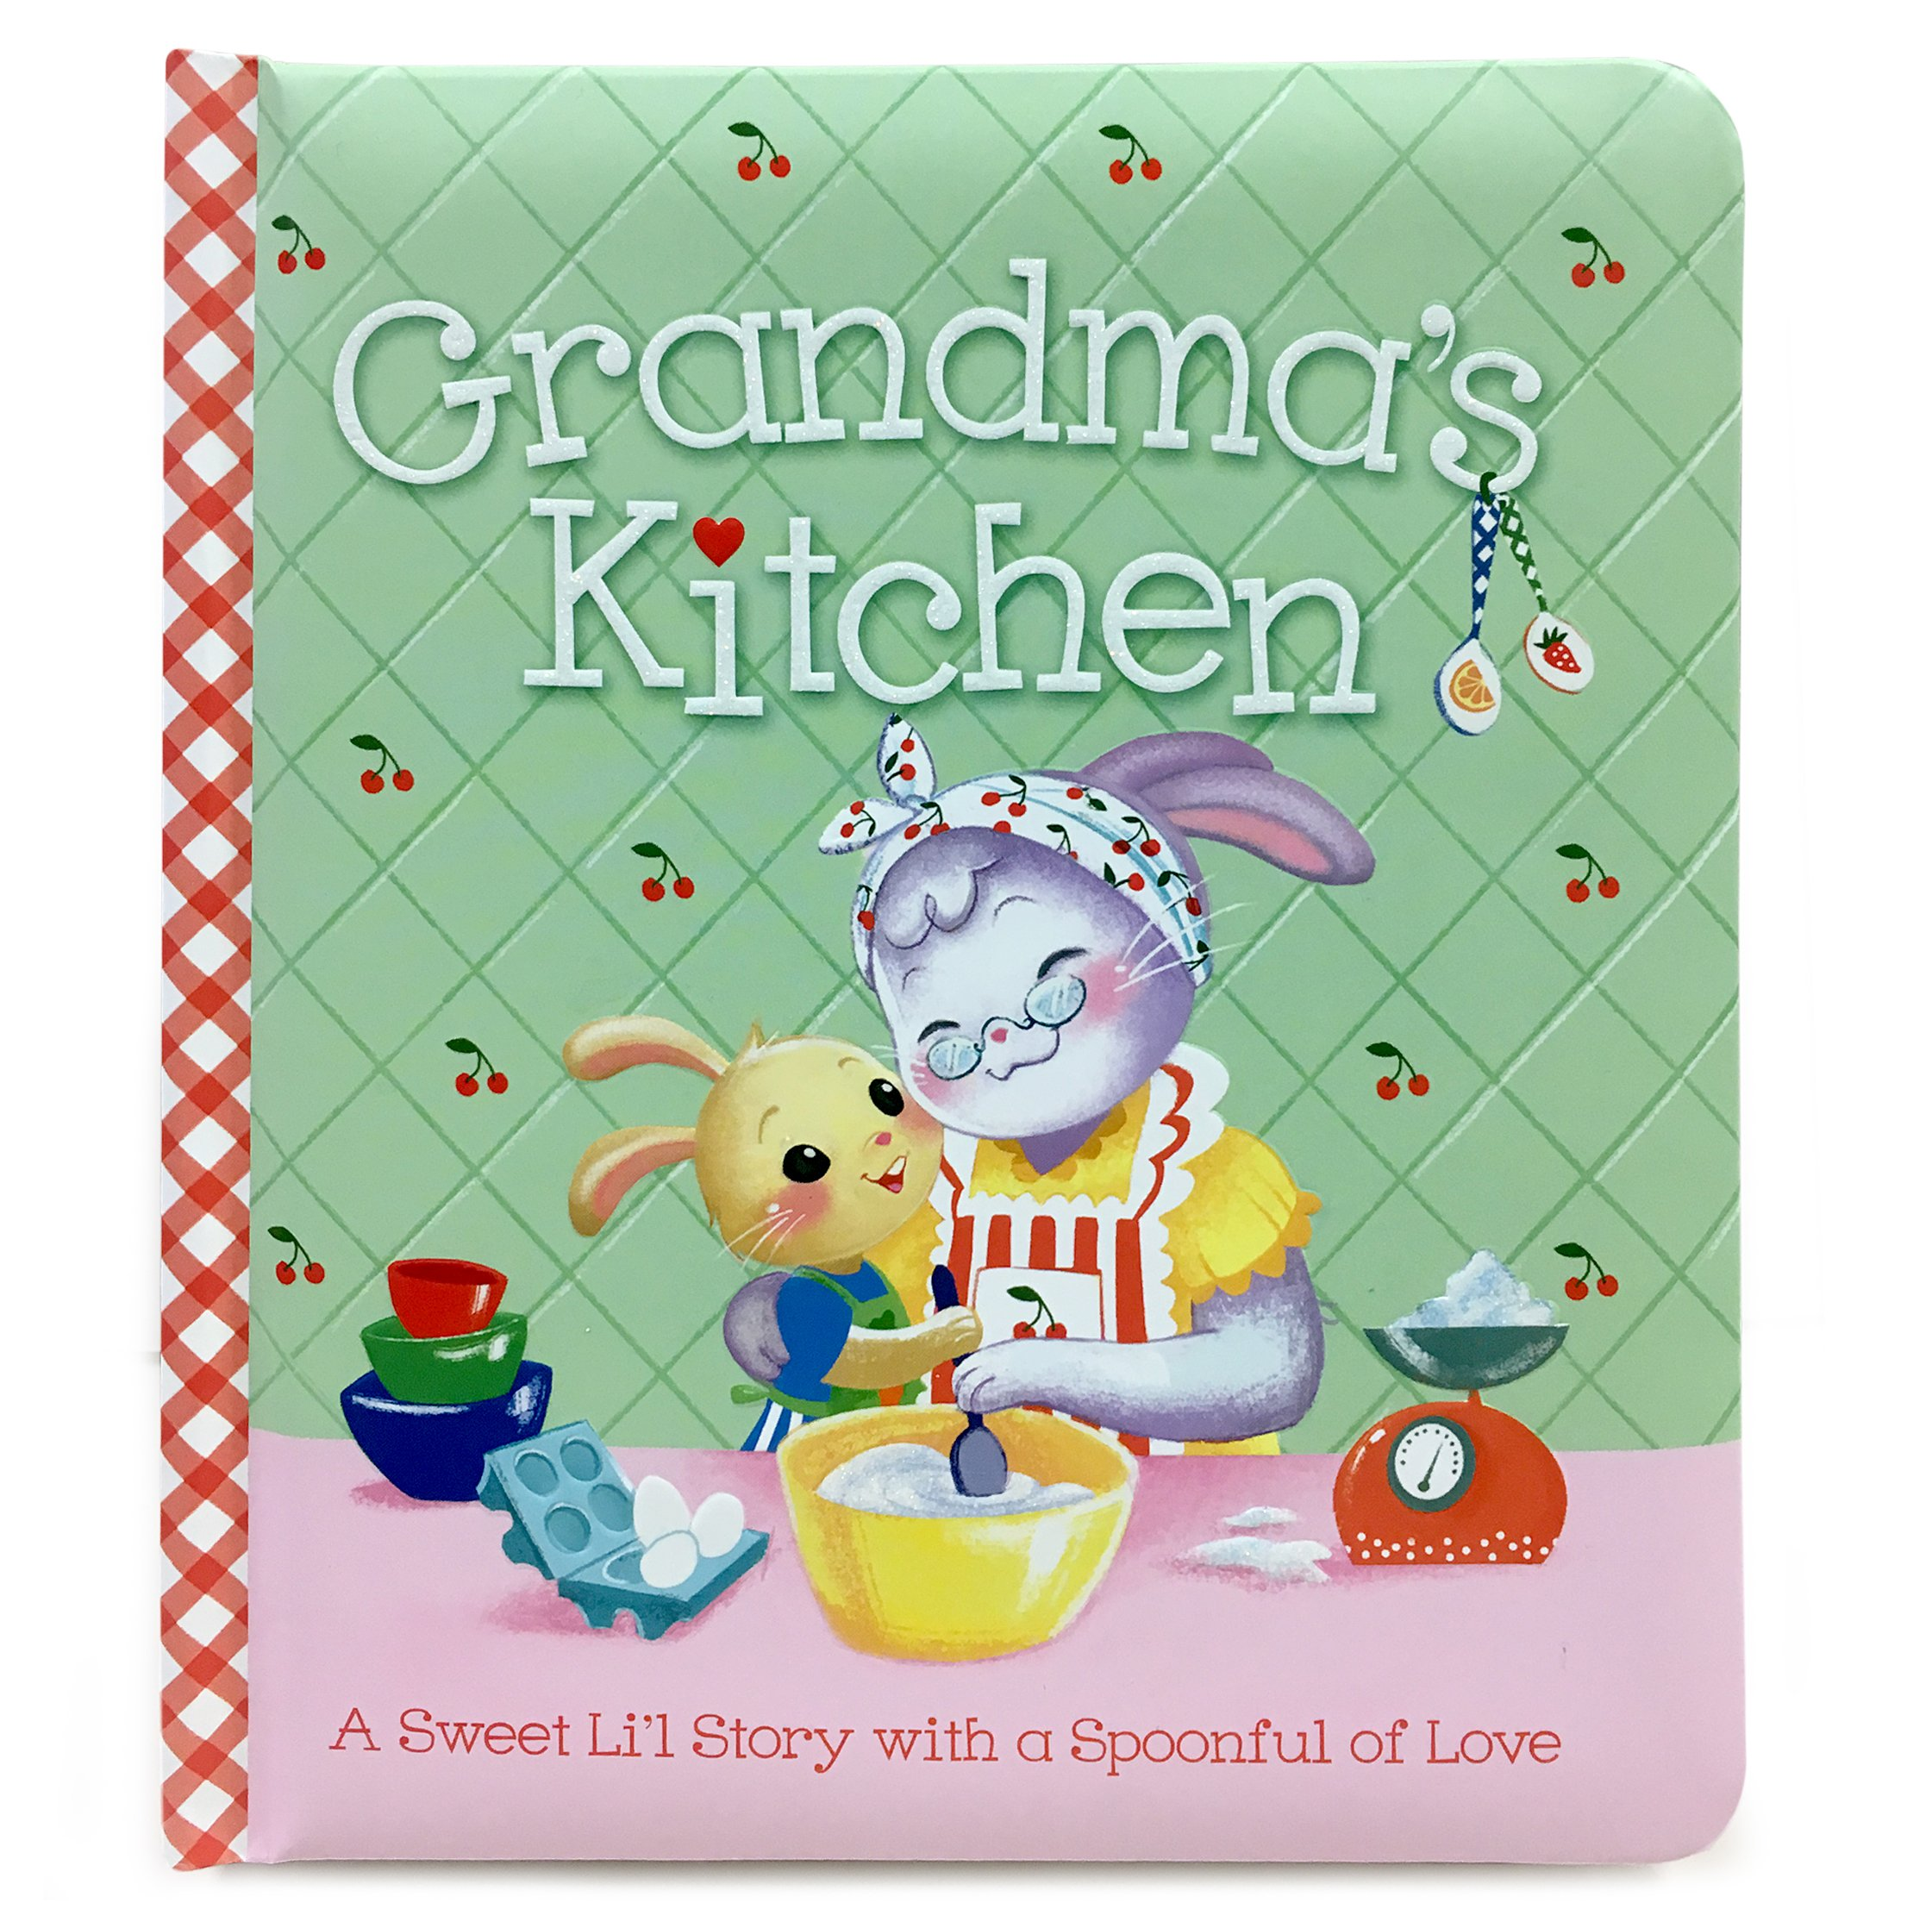 Grandma S Kitchen Padded Board Book Lodi Madison Cottage Door Press Deluca Francesca 9781680522754 Books Amazon Ca